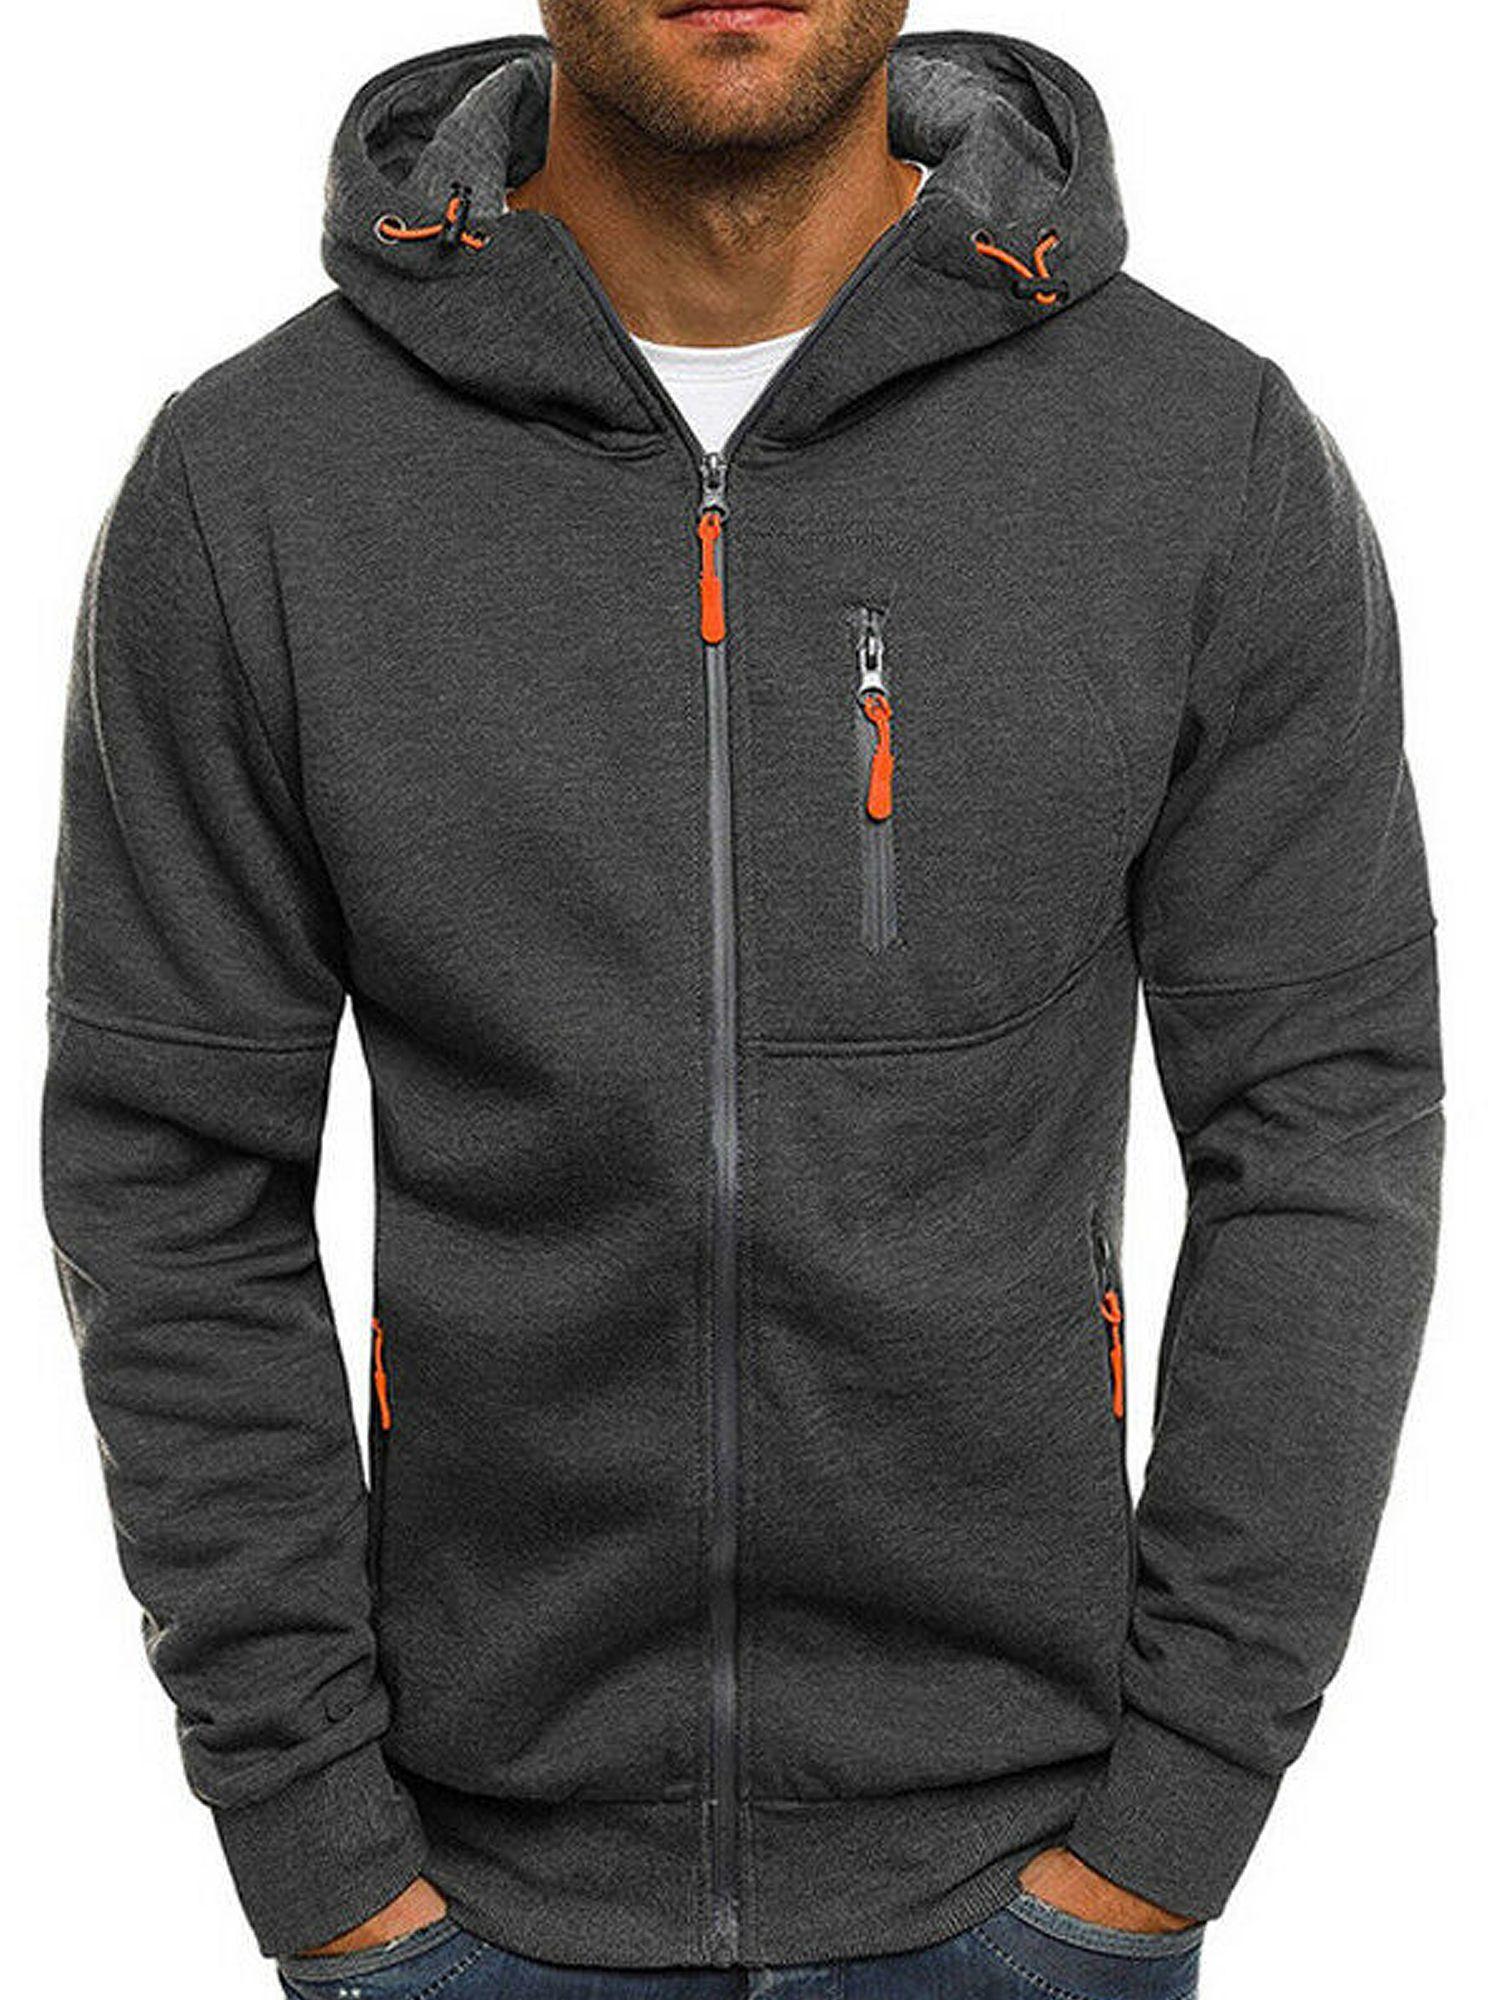 Lookwoild Lookwoild Men S Winter Hoodies Long Sleeve Sweatshirt Outwear Warm Coat Jacket Walmart Com In 2021 Mens Hoodies Casual Hoodies Men Mens Sweatshirts Hoodie [ 2000 x 1500 Pixel ]